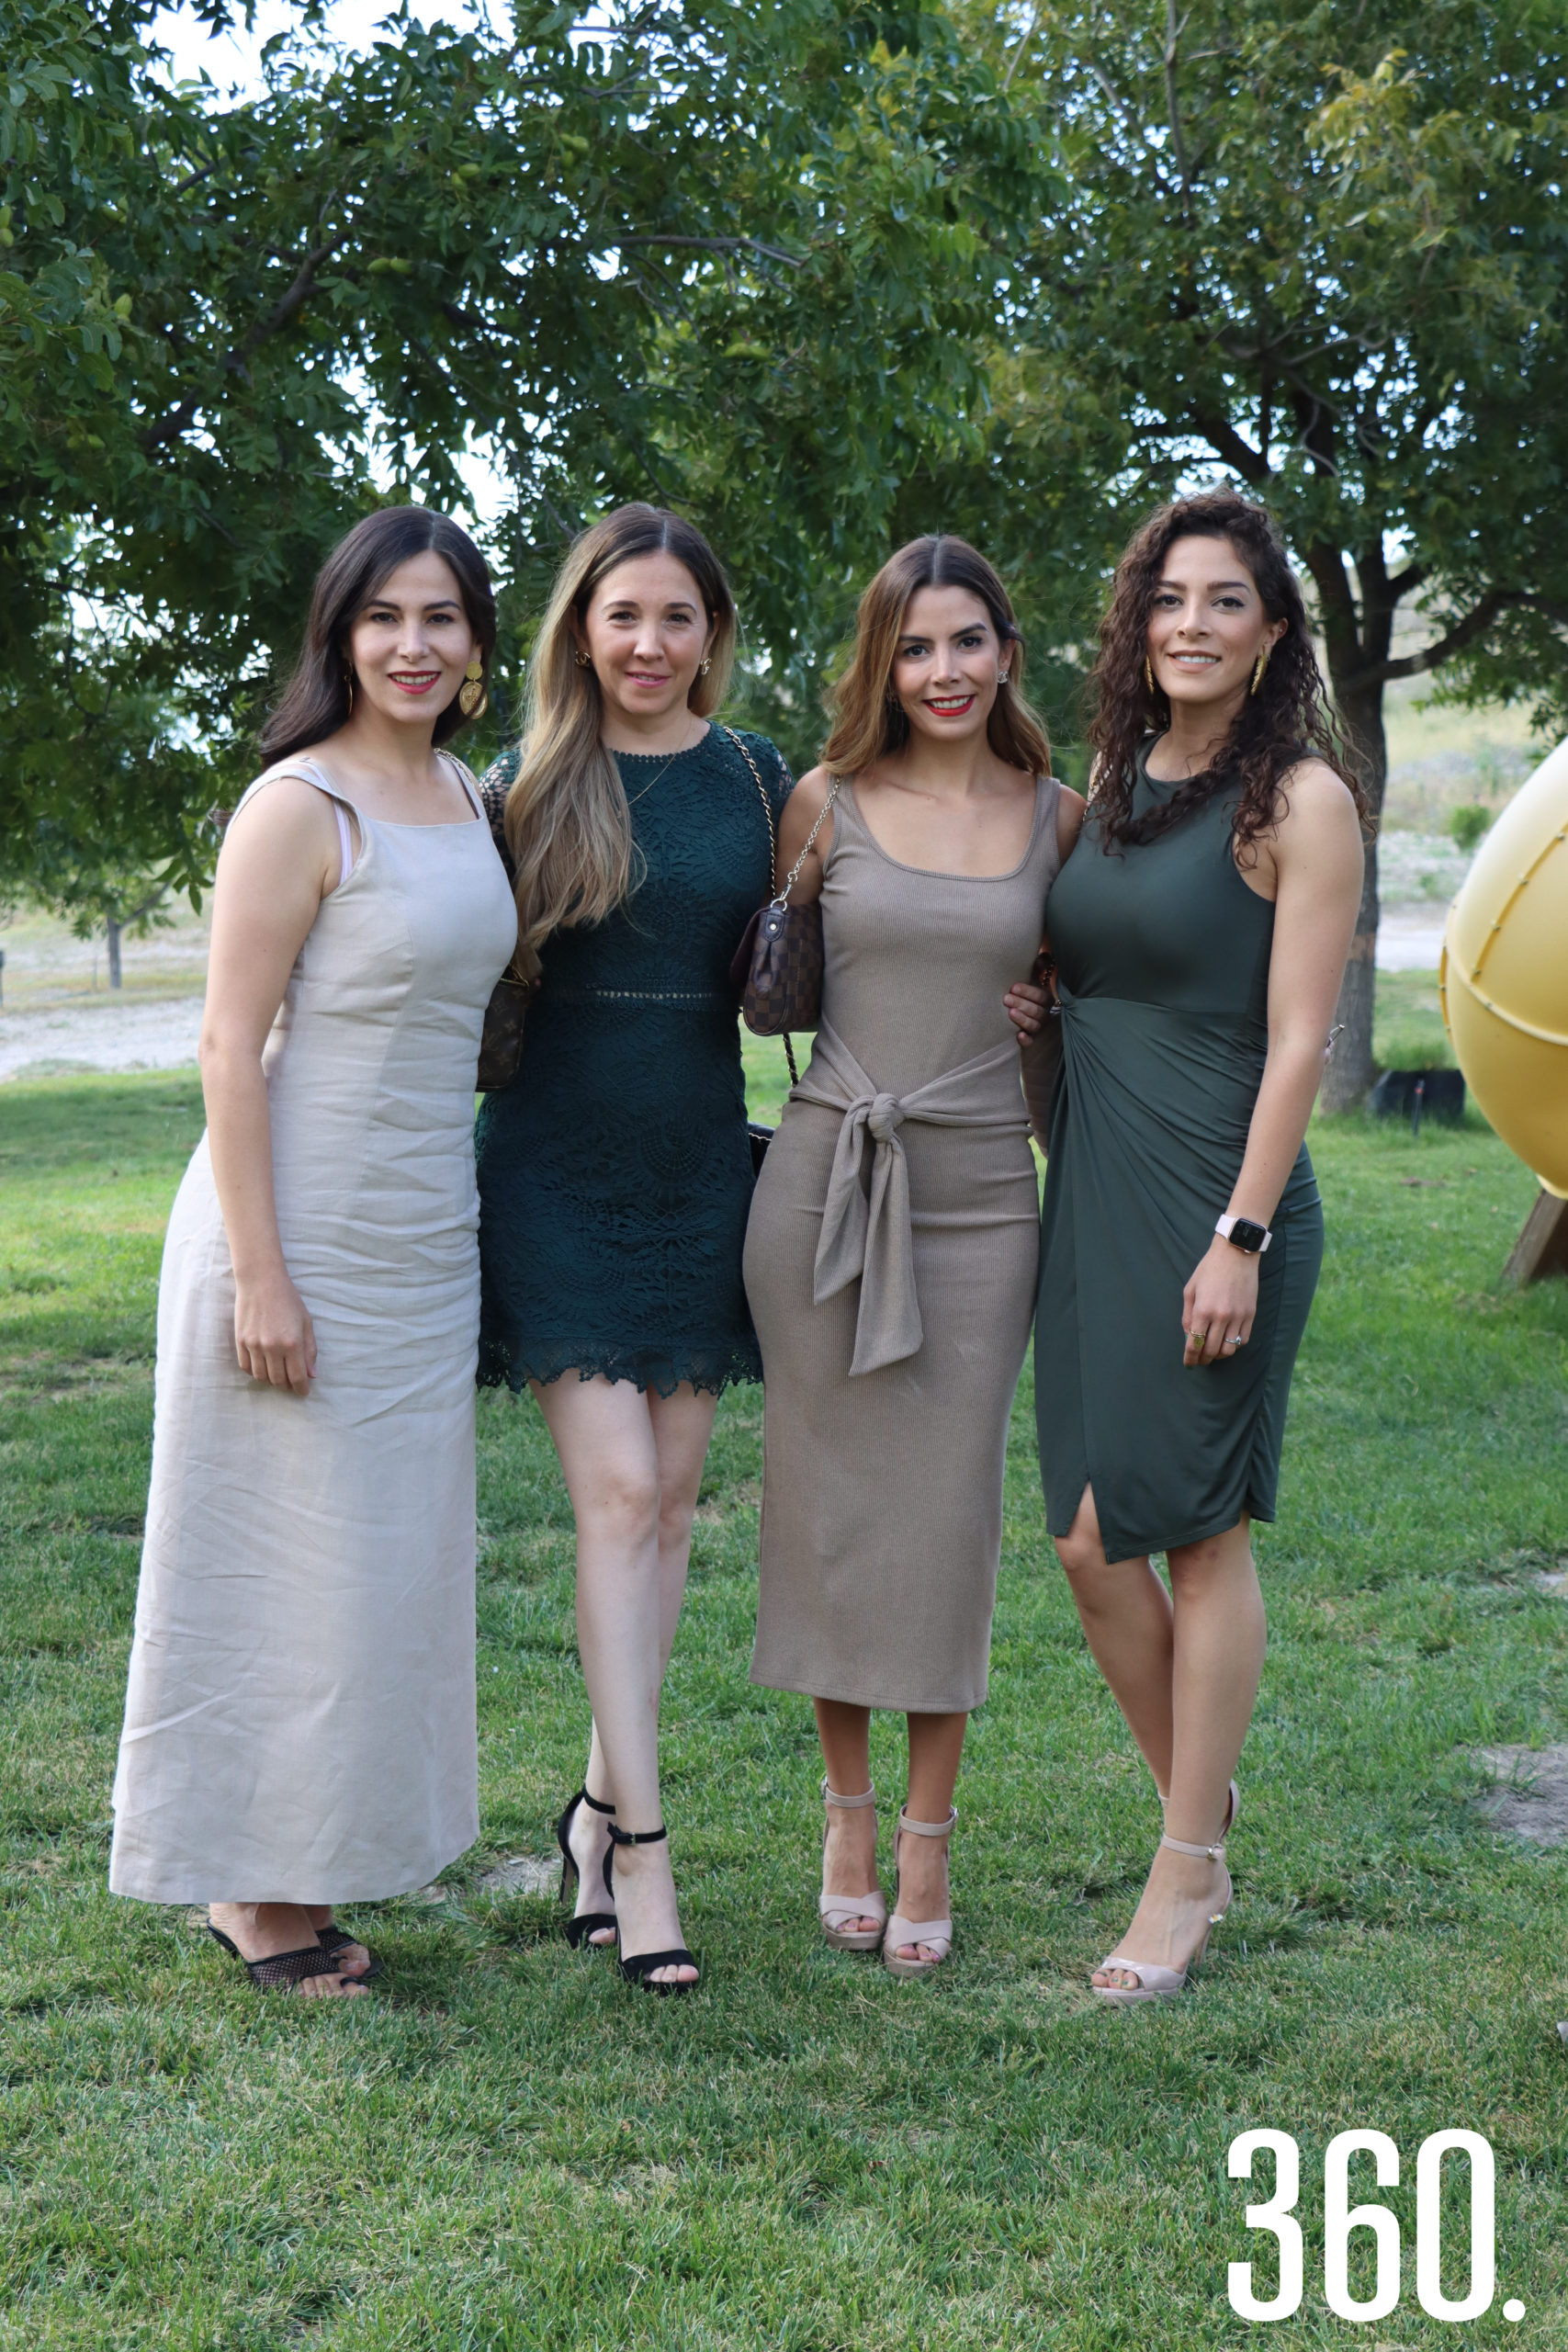 Mónica Villarreal, Mireya Navarro, Sara Rodríguez y Frida Mancha